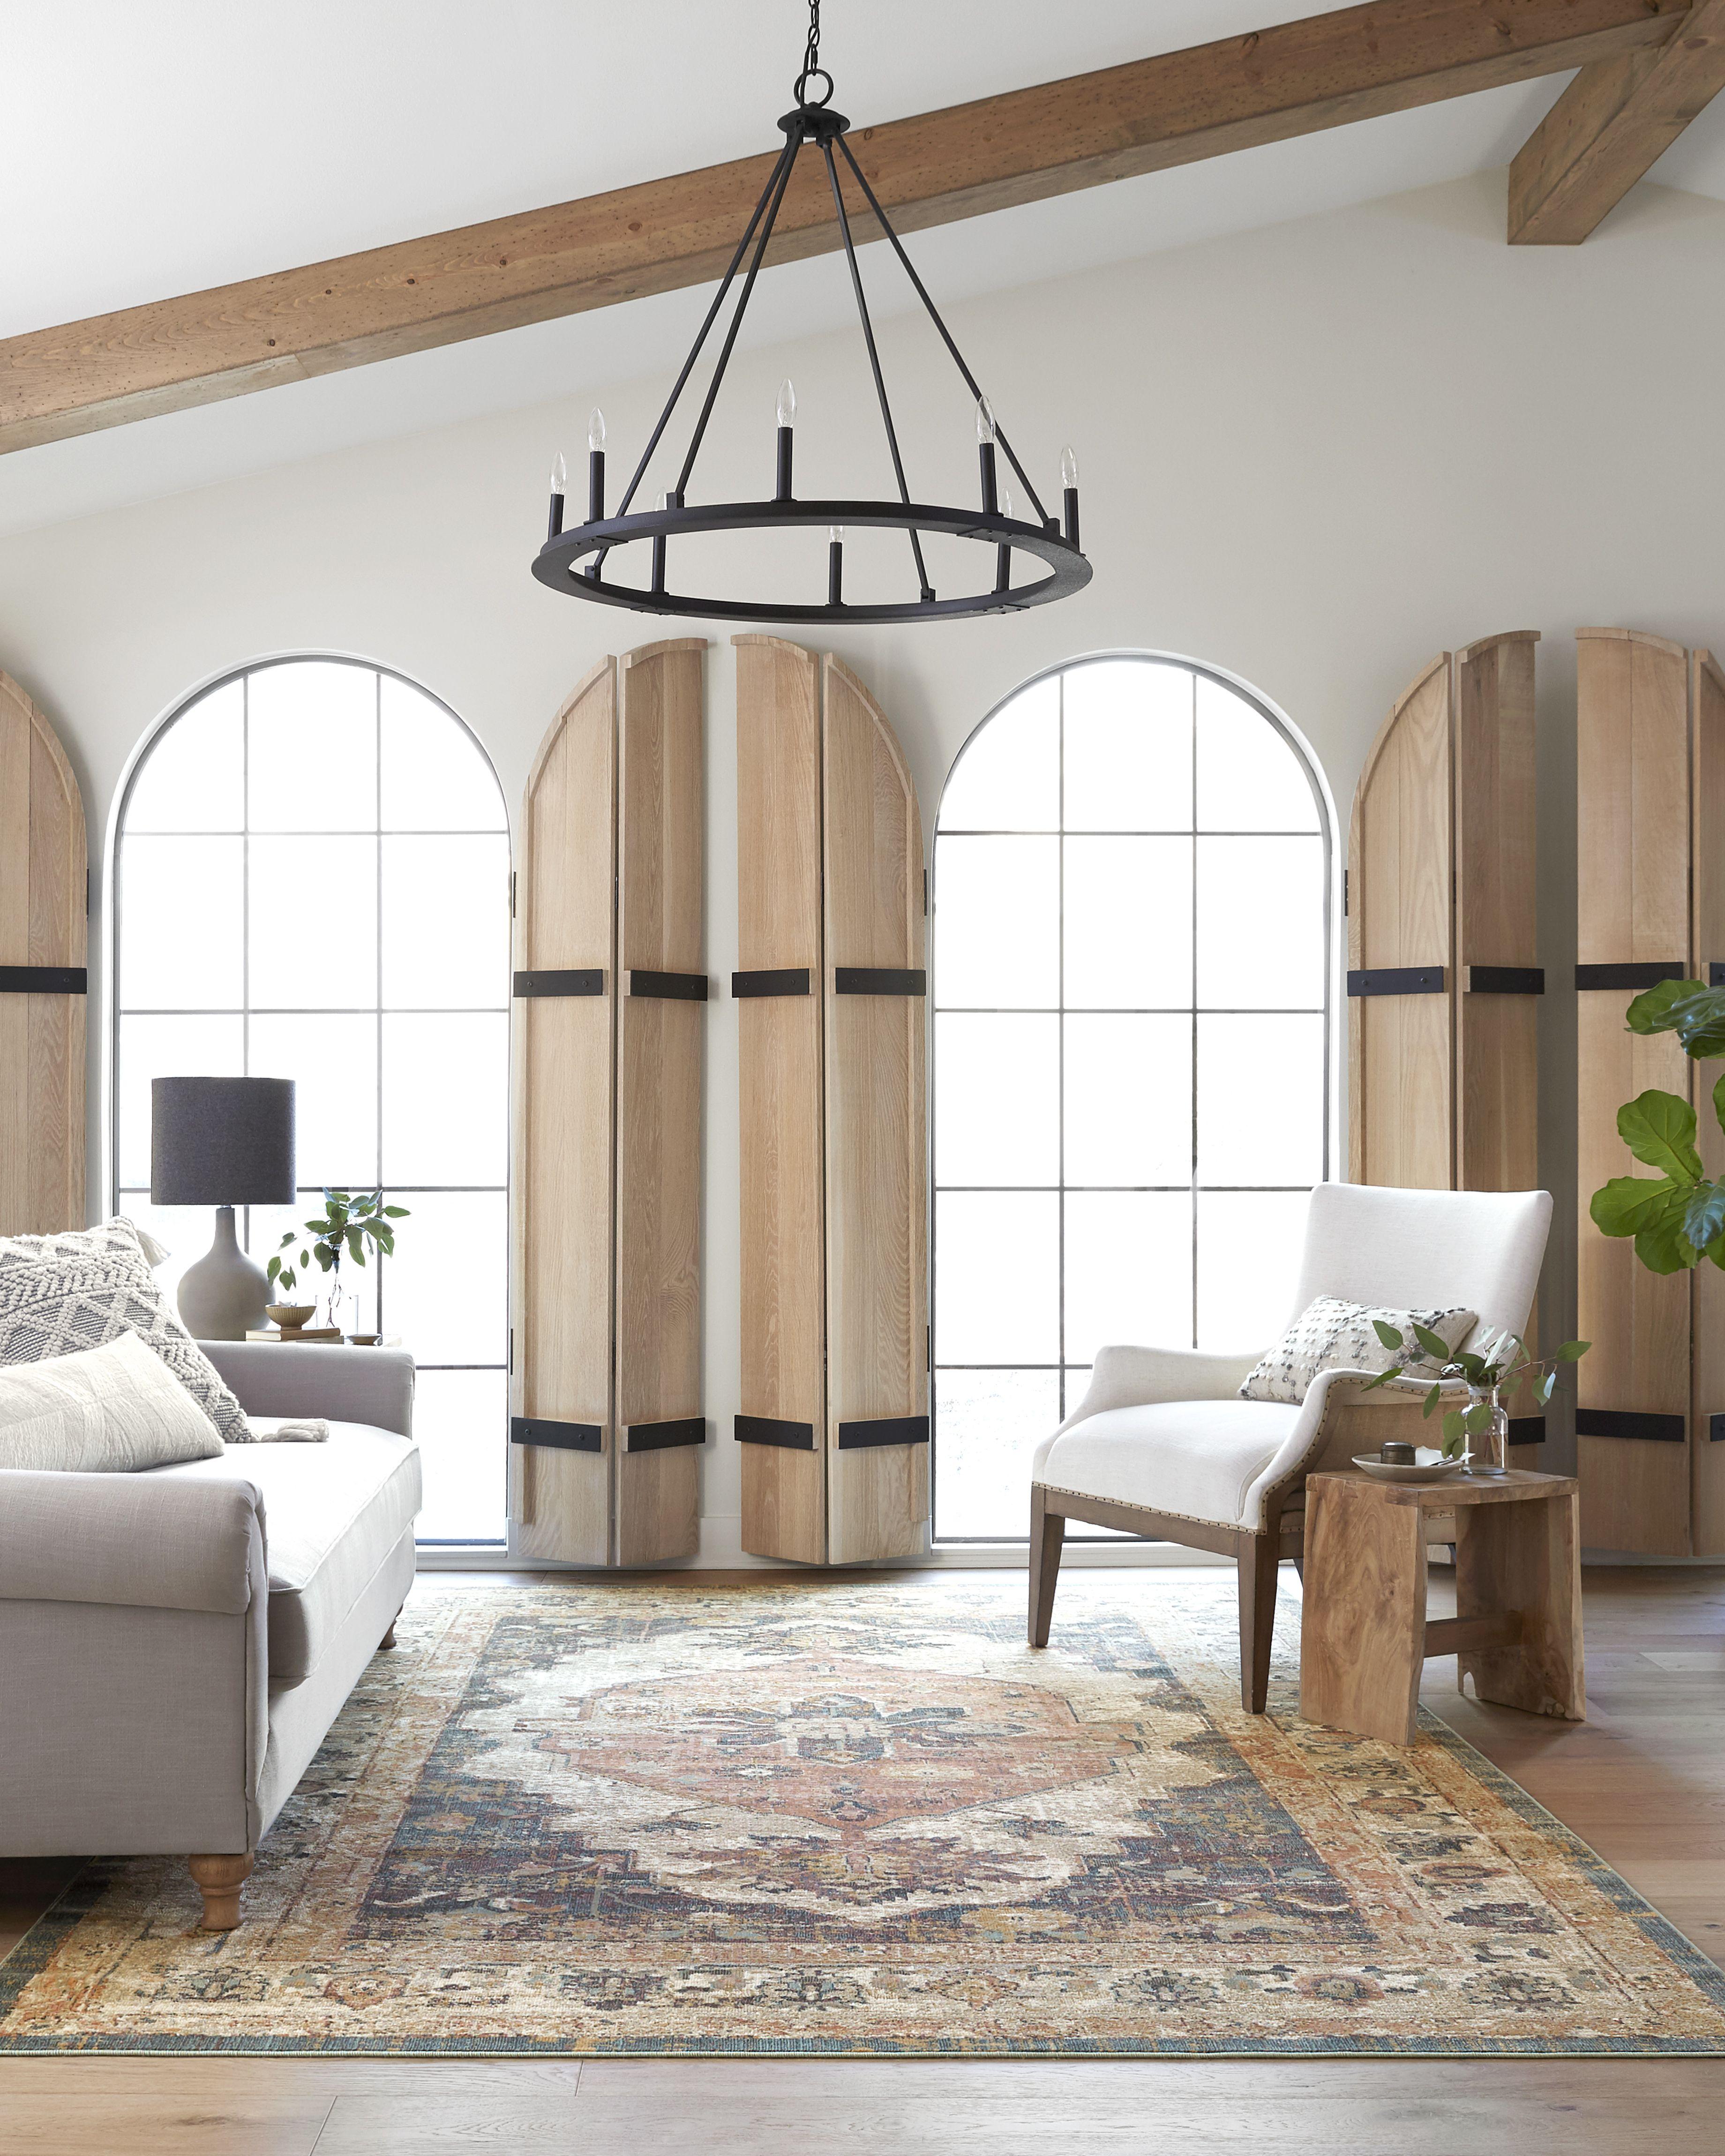 Magnolia Homes Interiors: Magnolia Home Evie Rug By Joanna Gaines